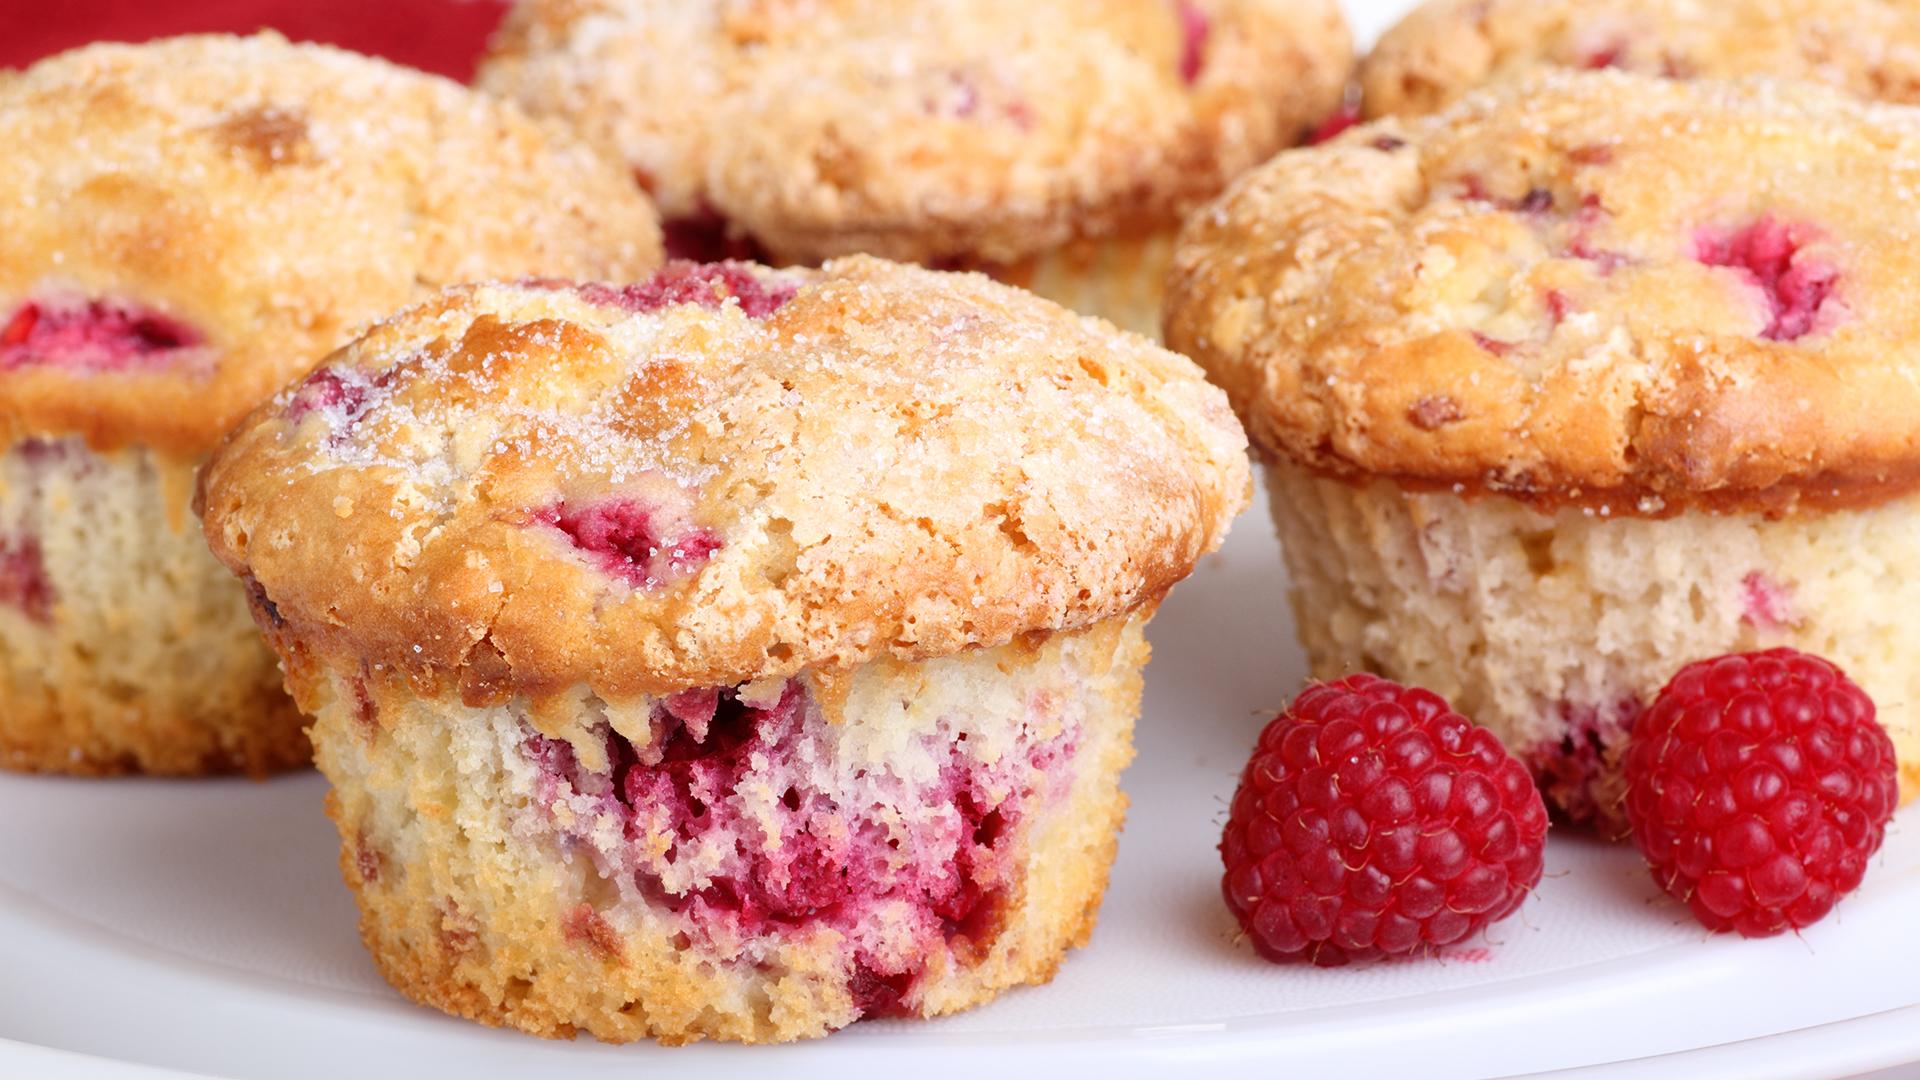 Raspberry Rhubarb Muffins - TODAY.com